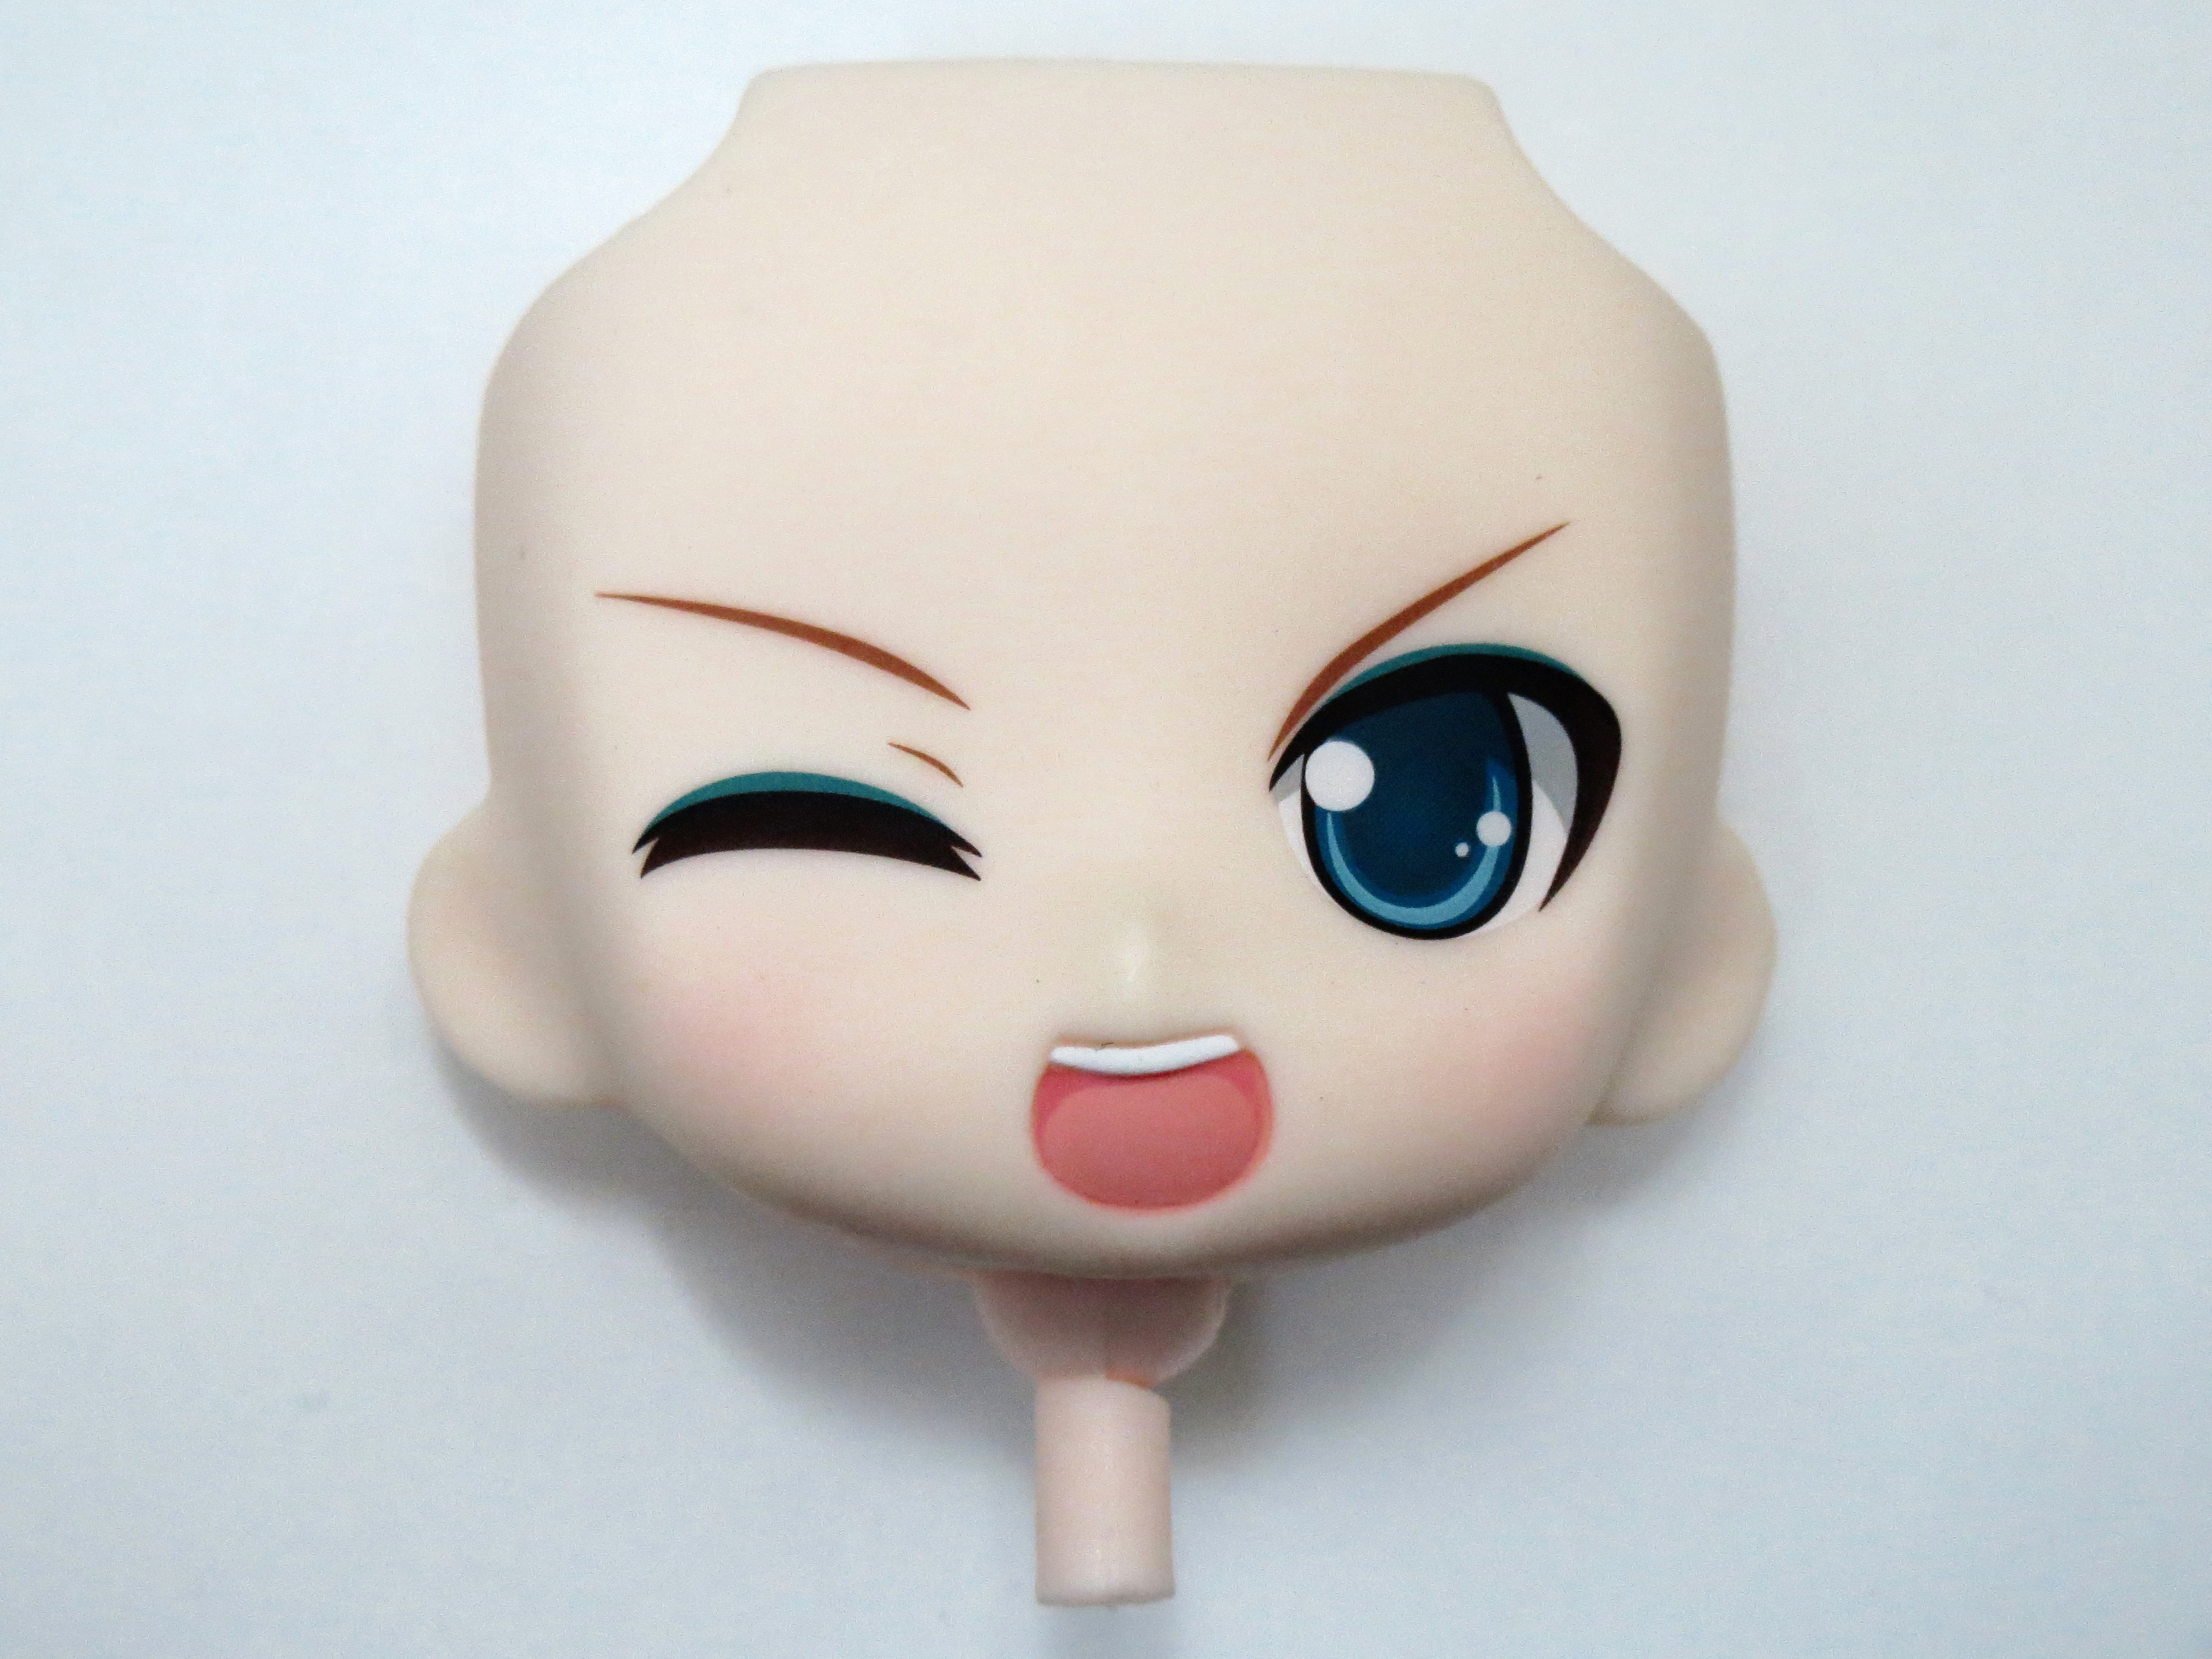 【286】 Lily from anim.o.v.e 顔パーツ 歌唱顔 ねんどろいど